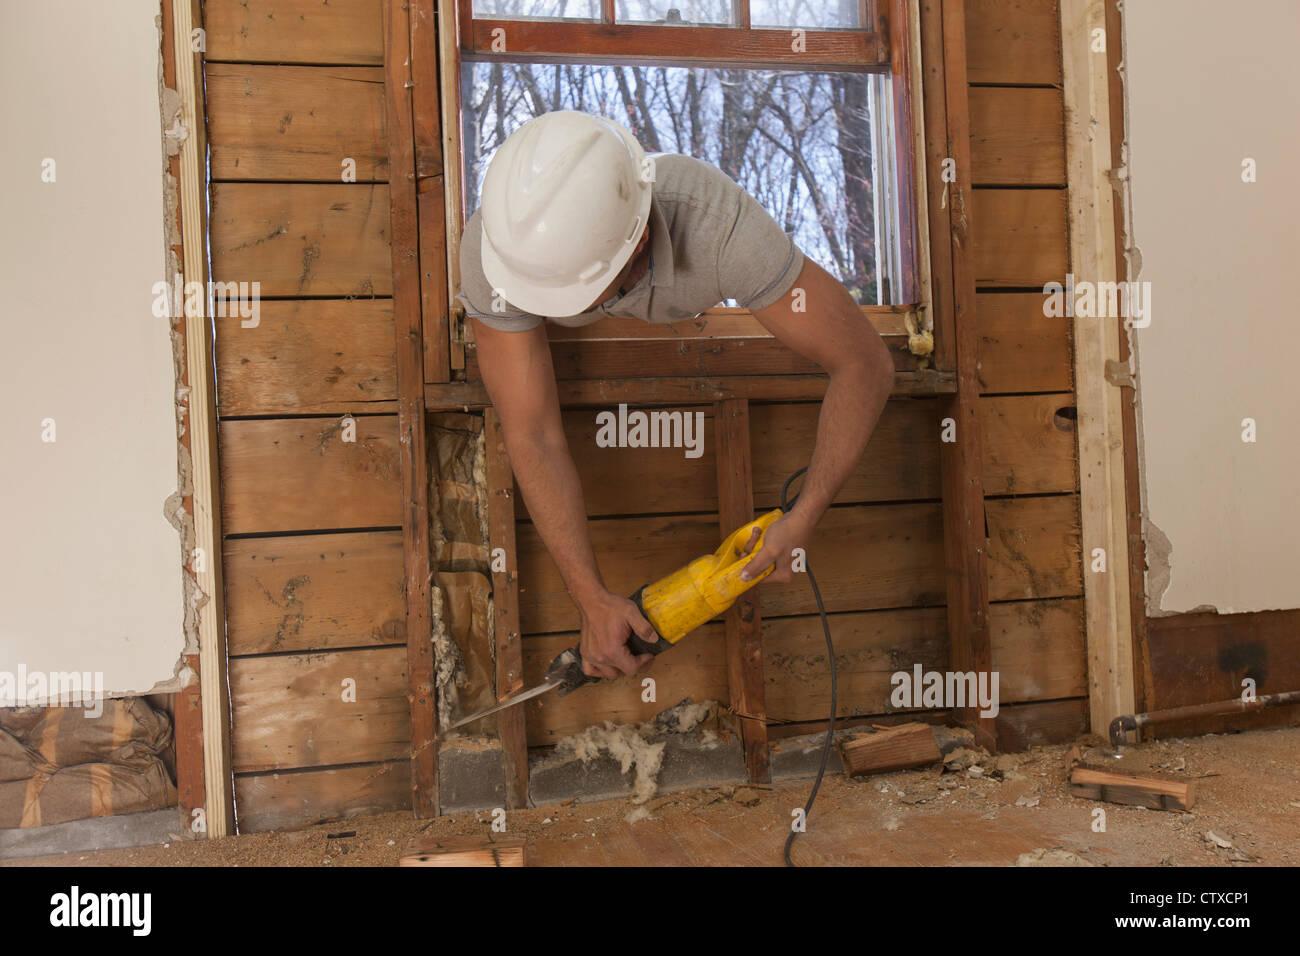 Saw Cutting Through Wall : Reciprocating stock photos images